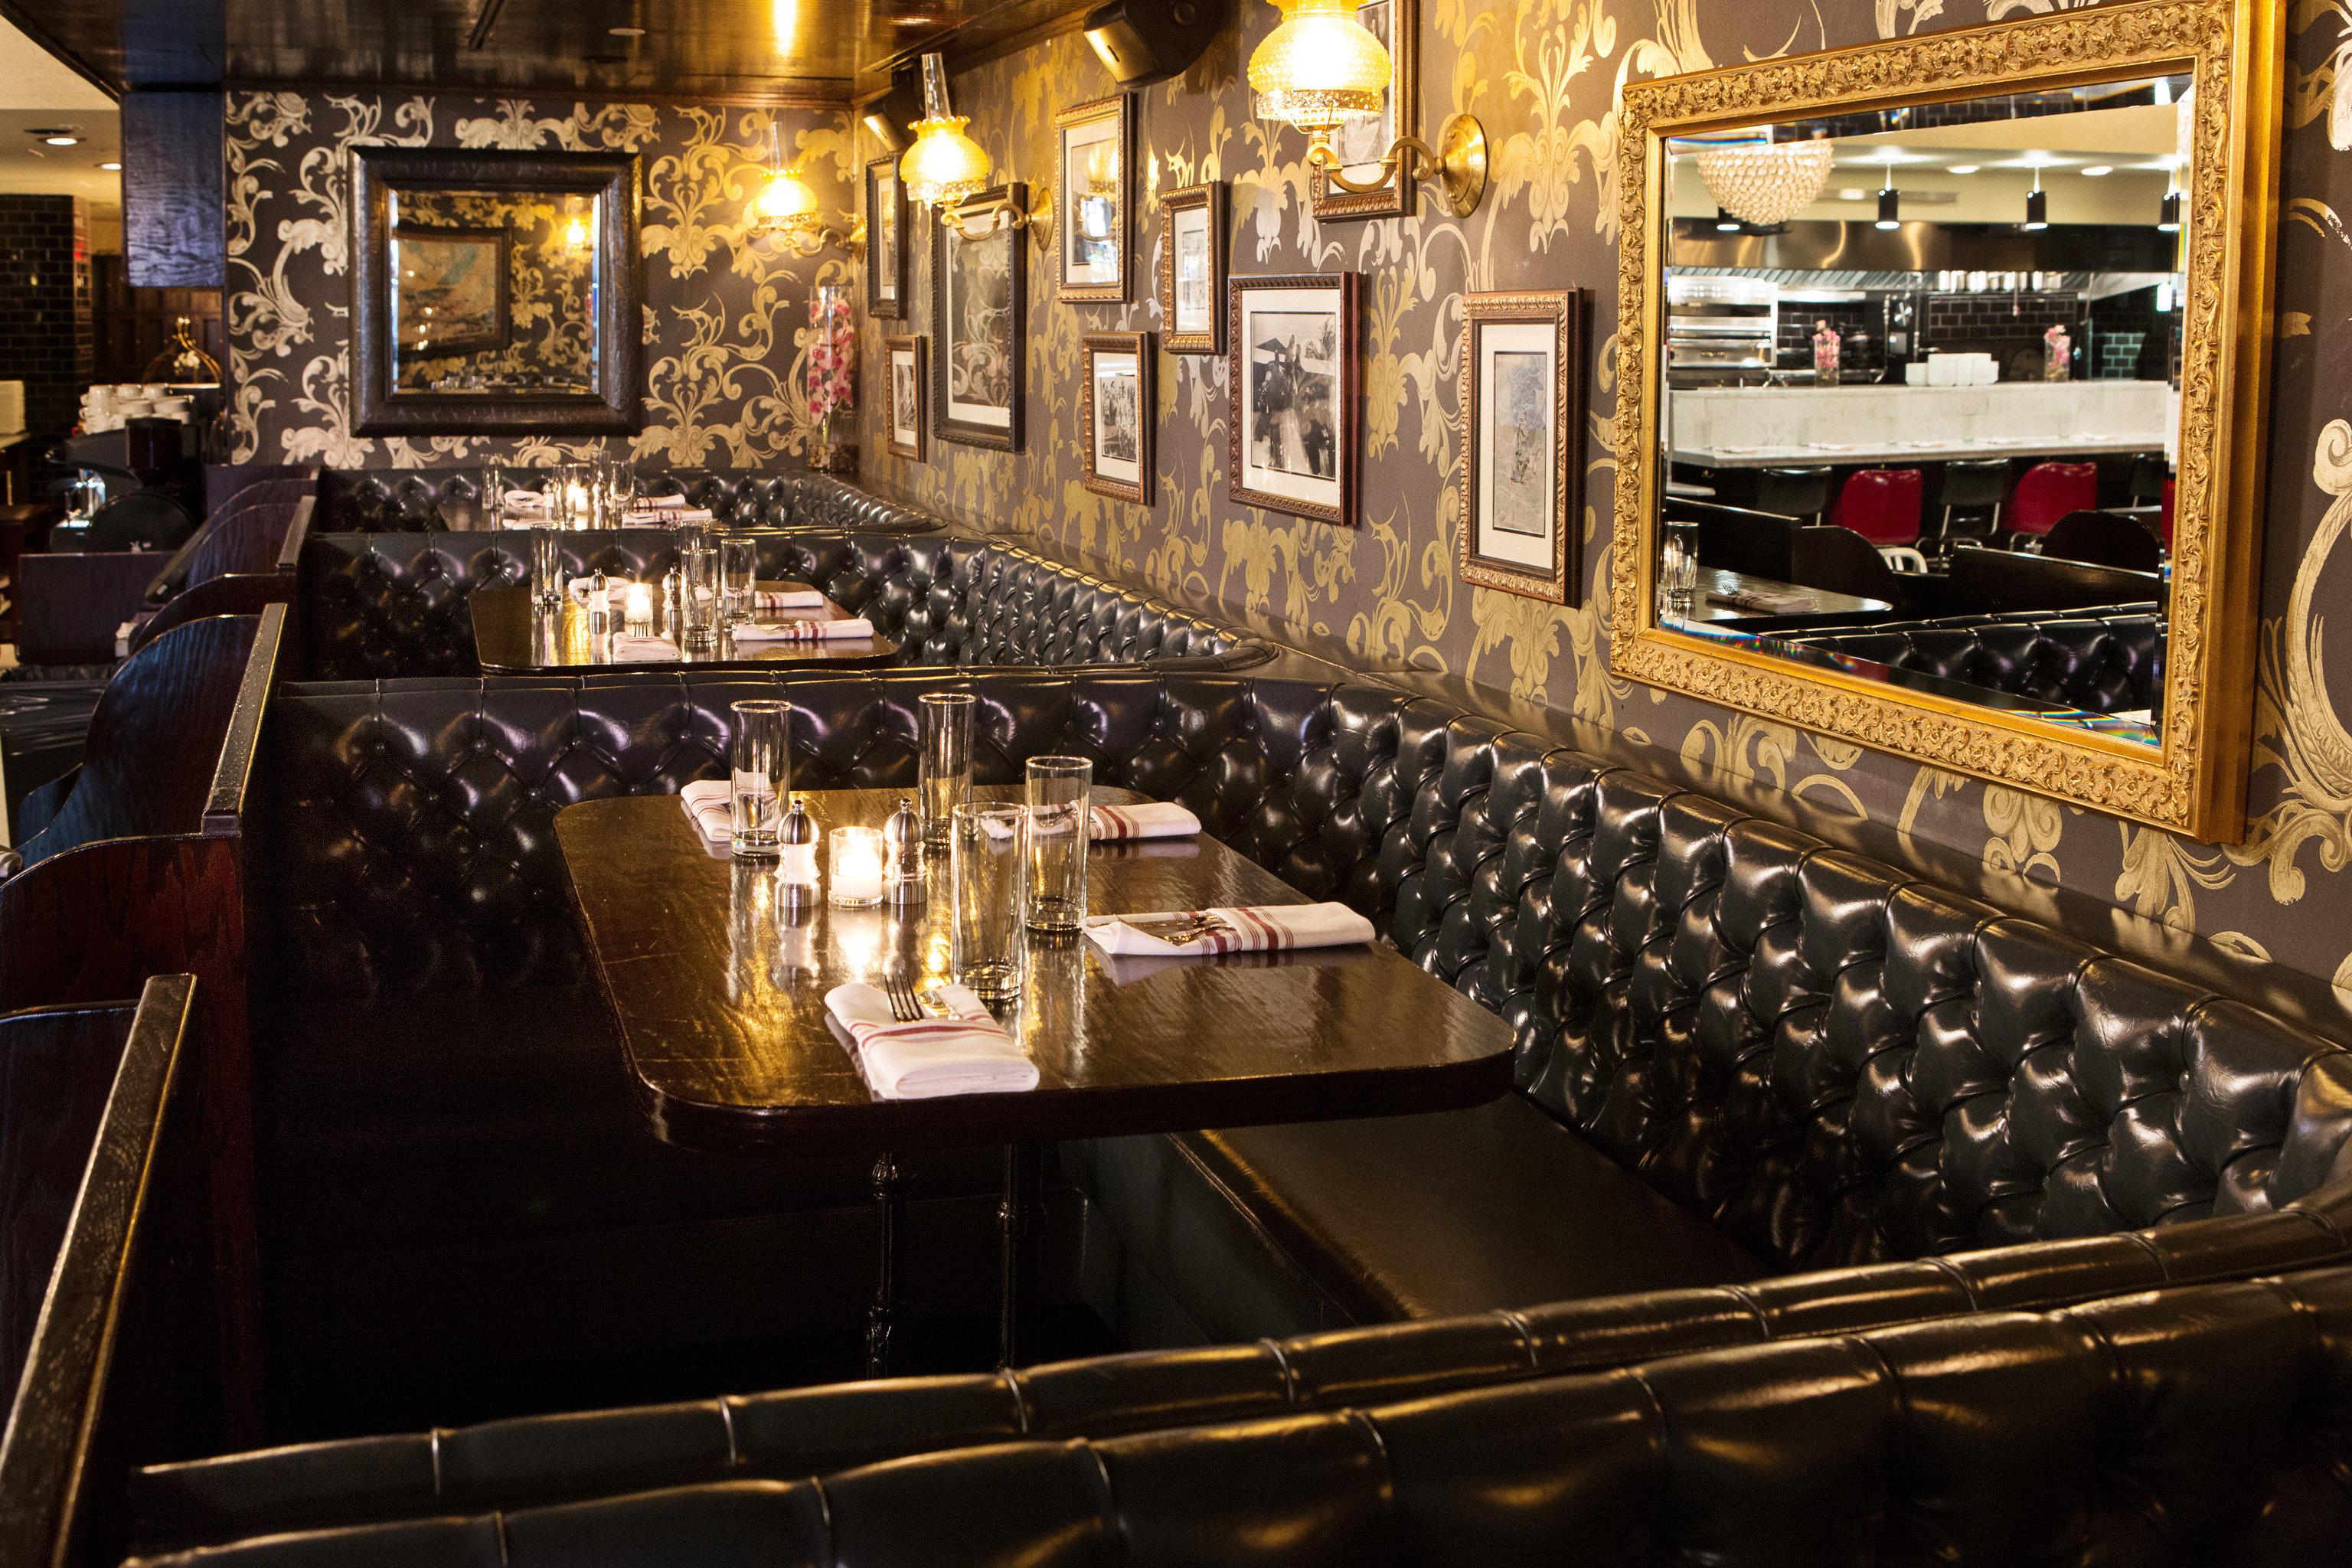 City Dining Drink Eat Modern Bar restaurant